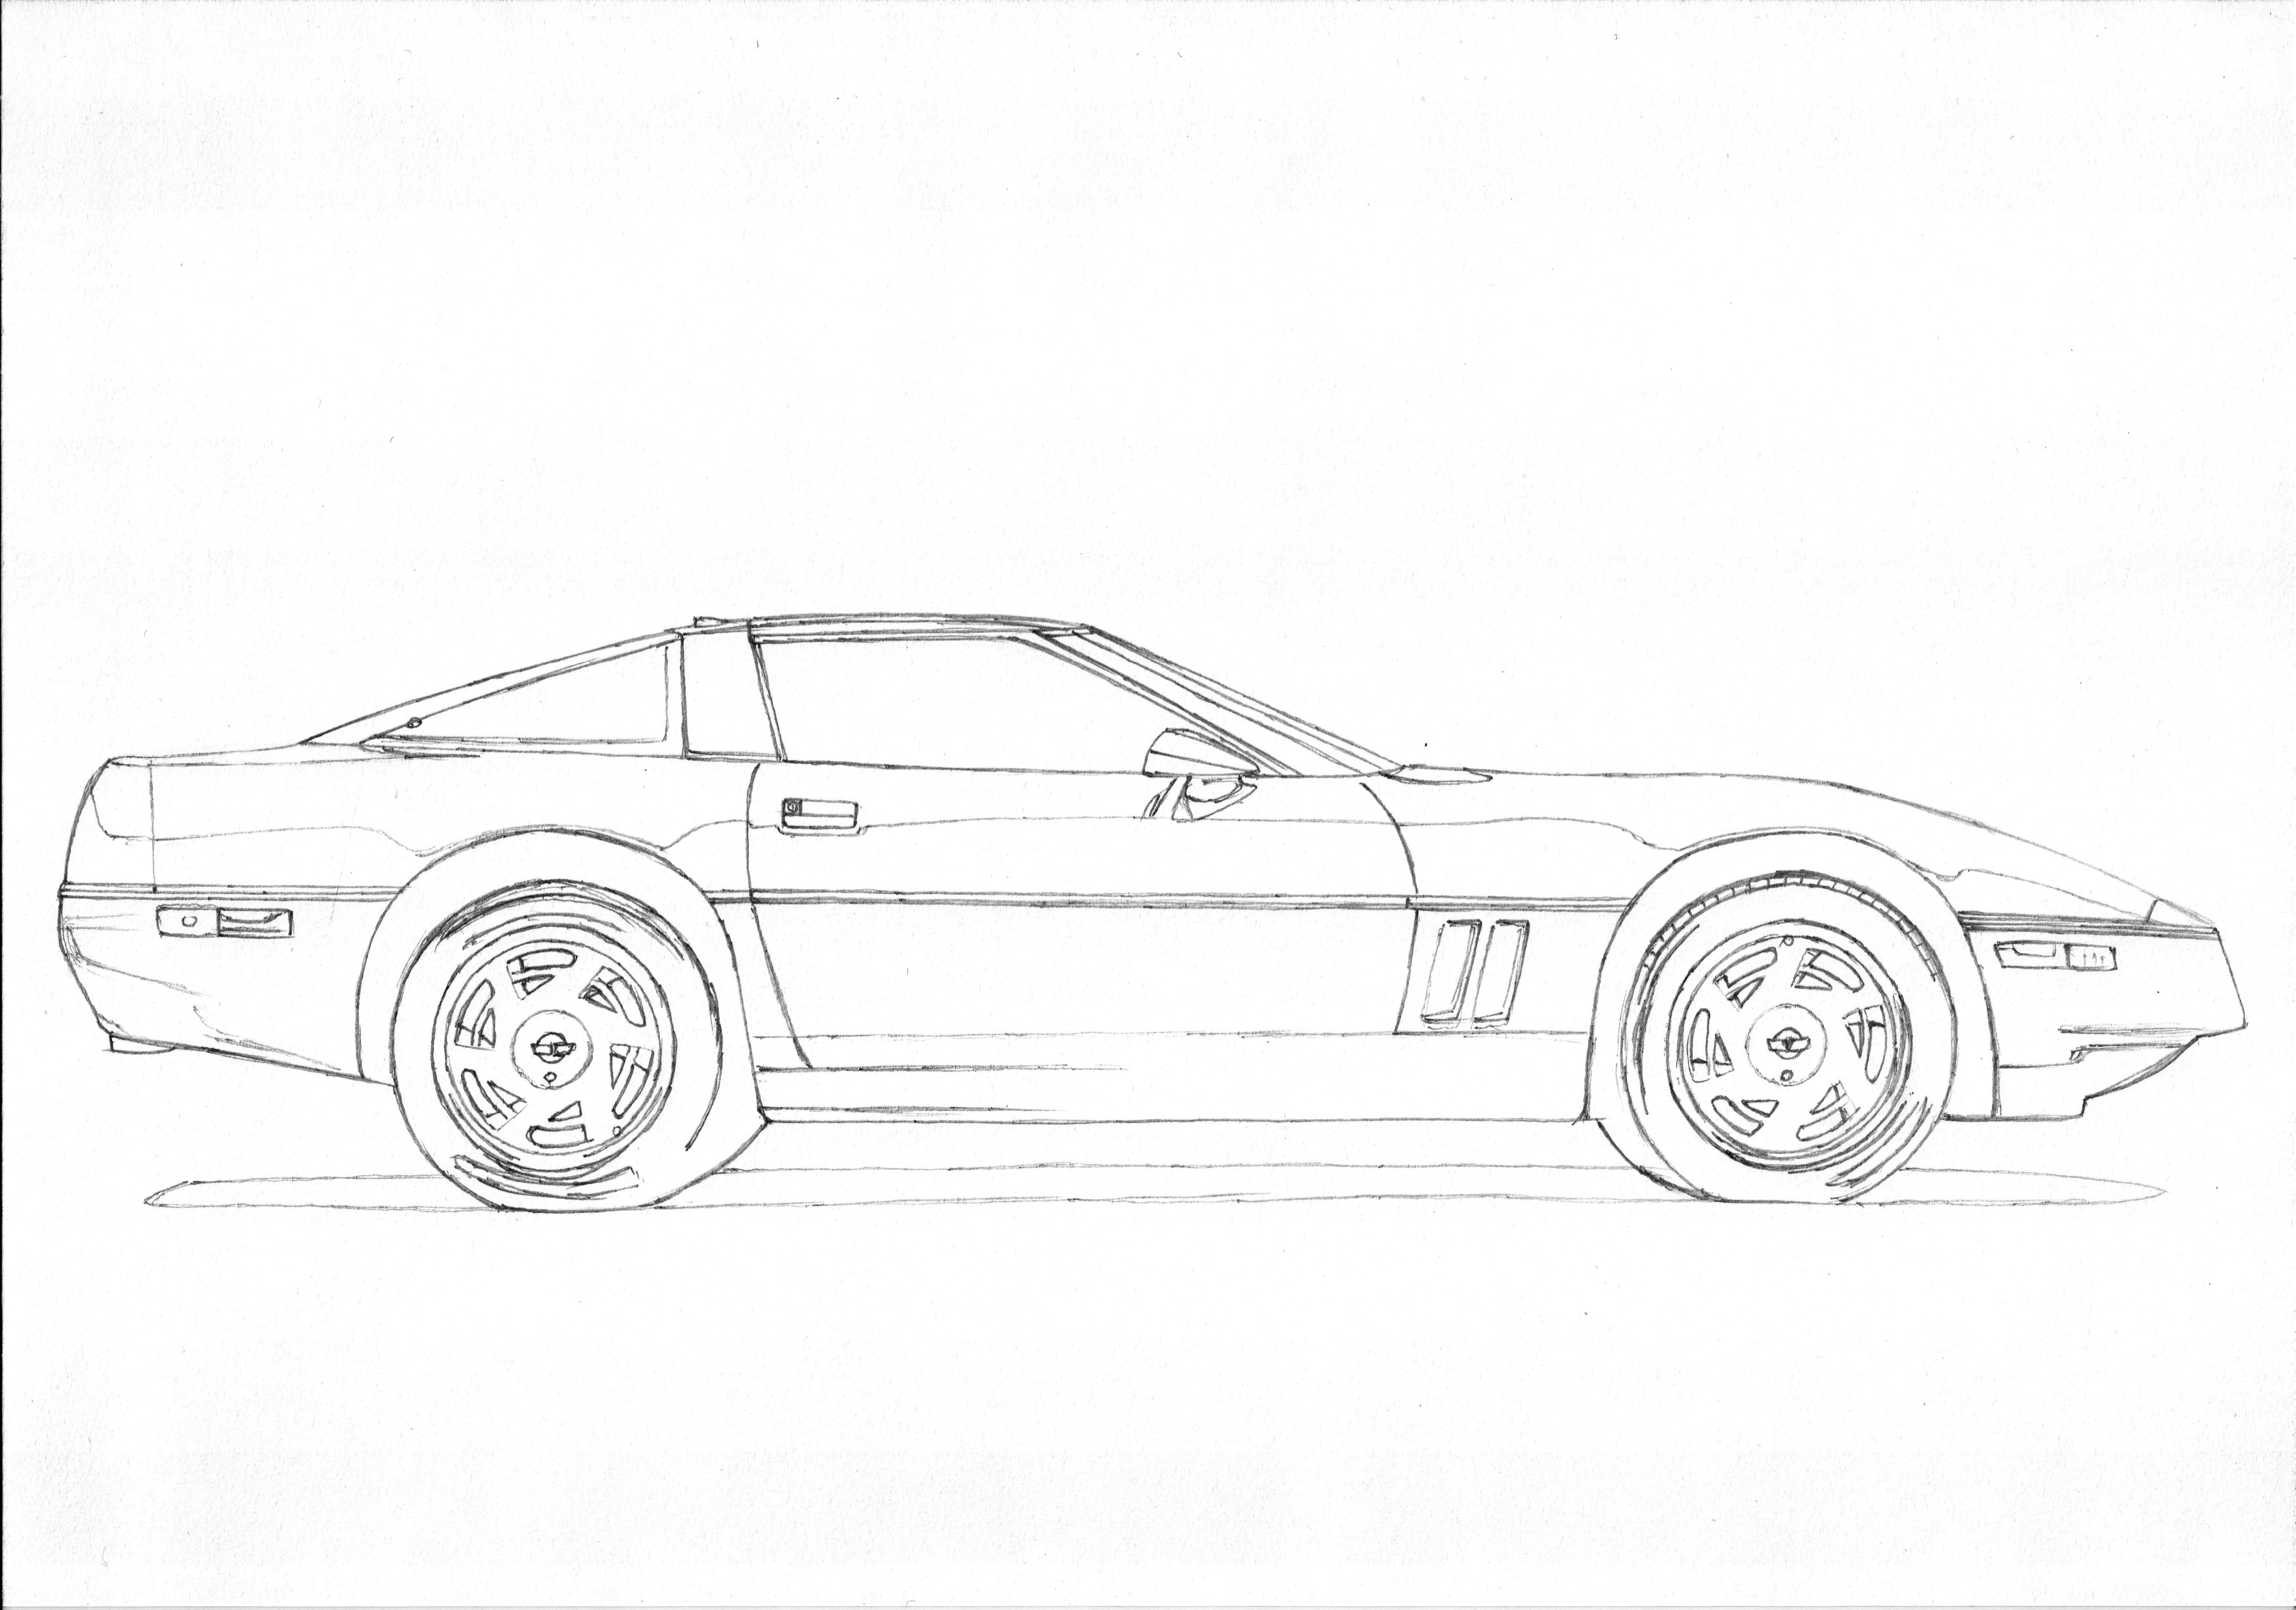 Chevrolet Corvette C4 1 3 American Sportscar In The Most